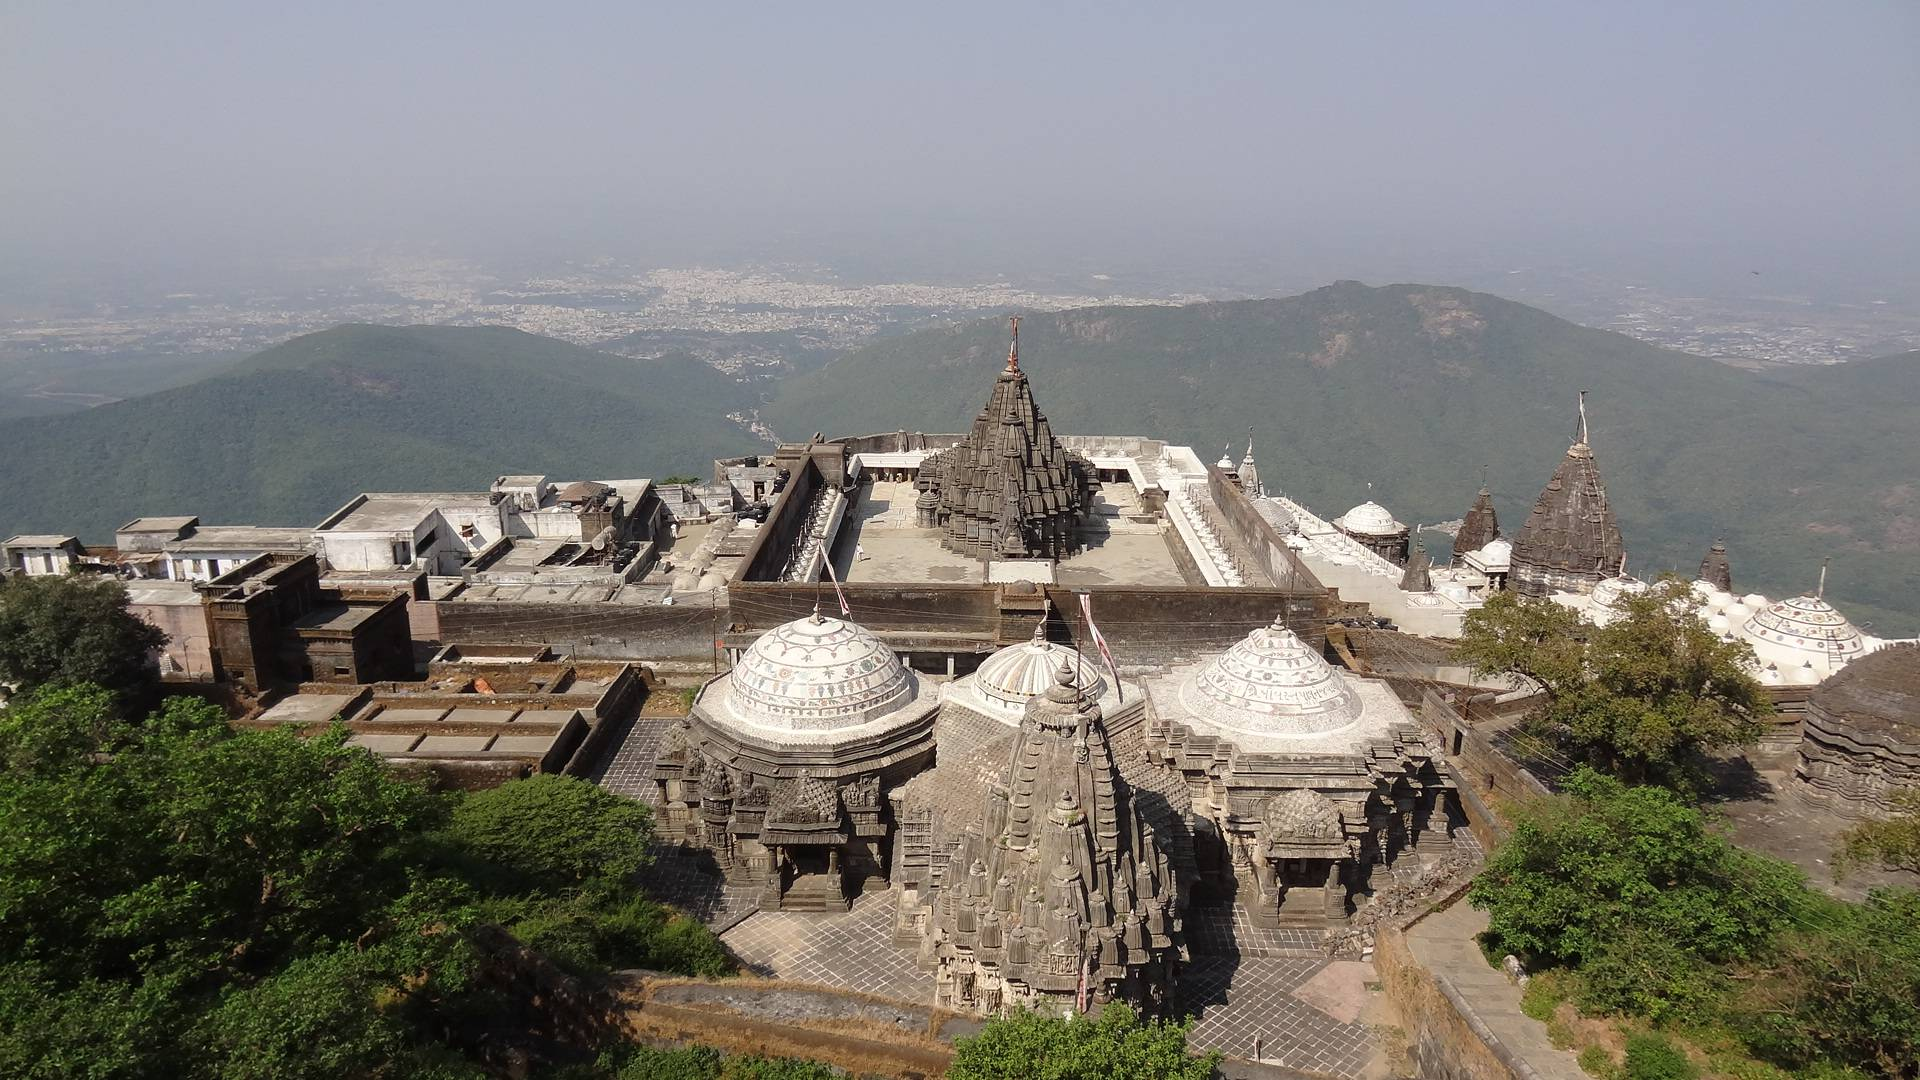 Photo 1: Un lieu de pèlerinage au Gujarat